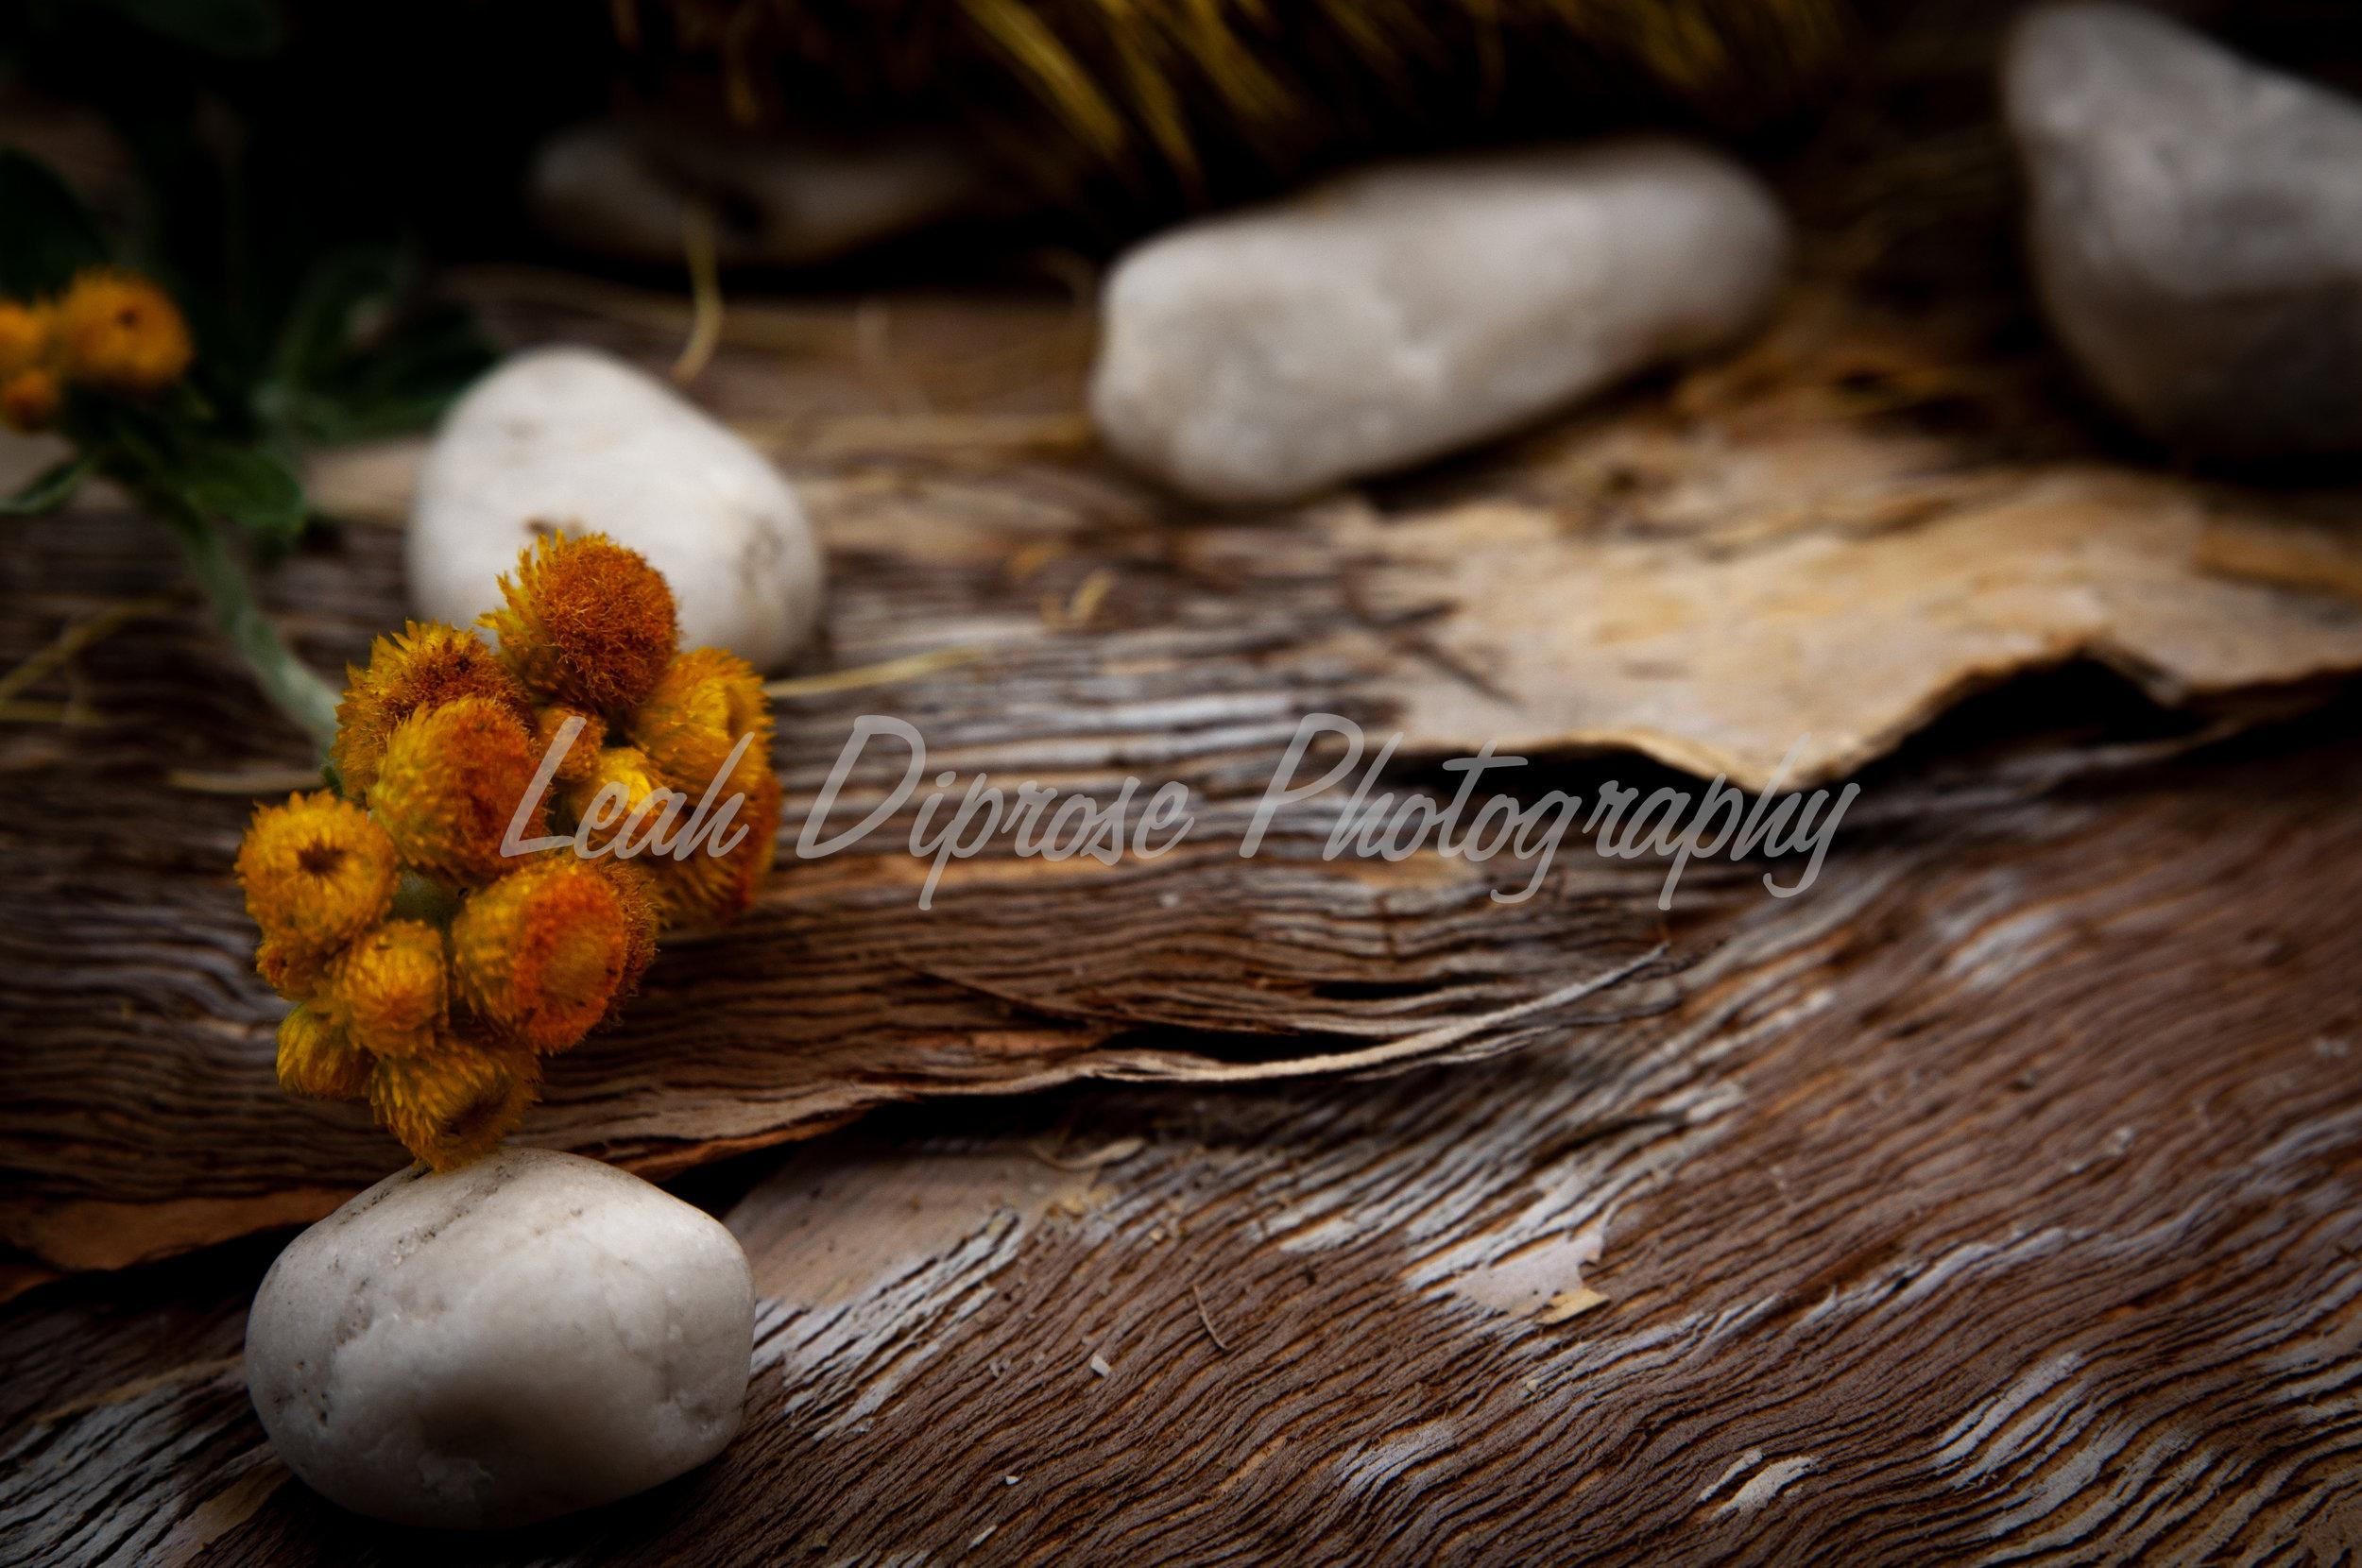 Leah Diprose Photography image-1590.jpg